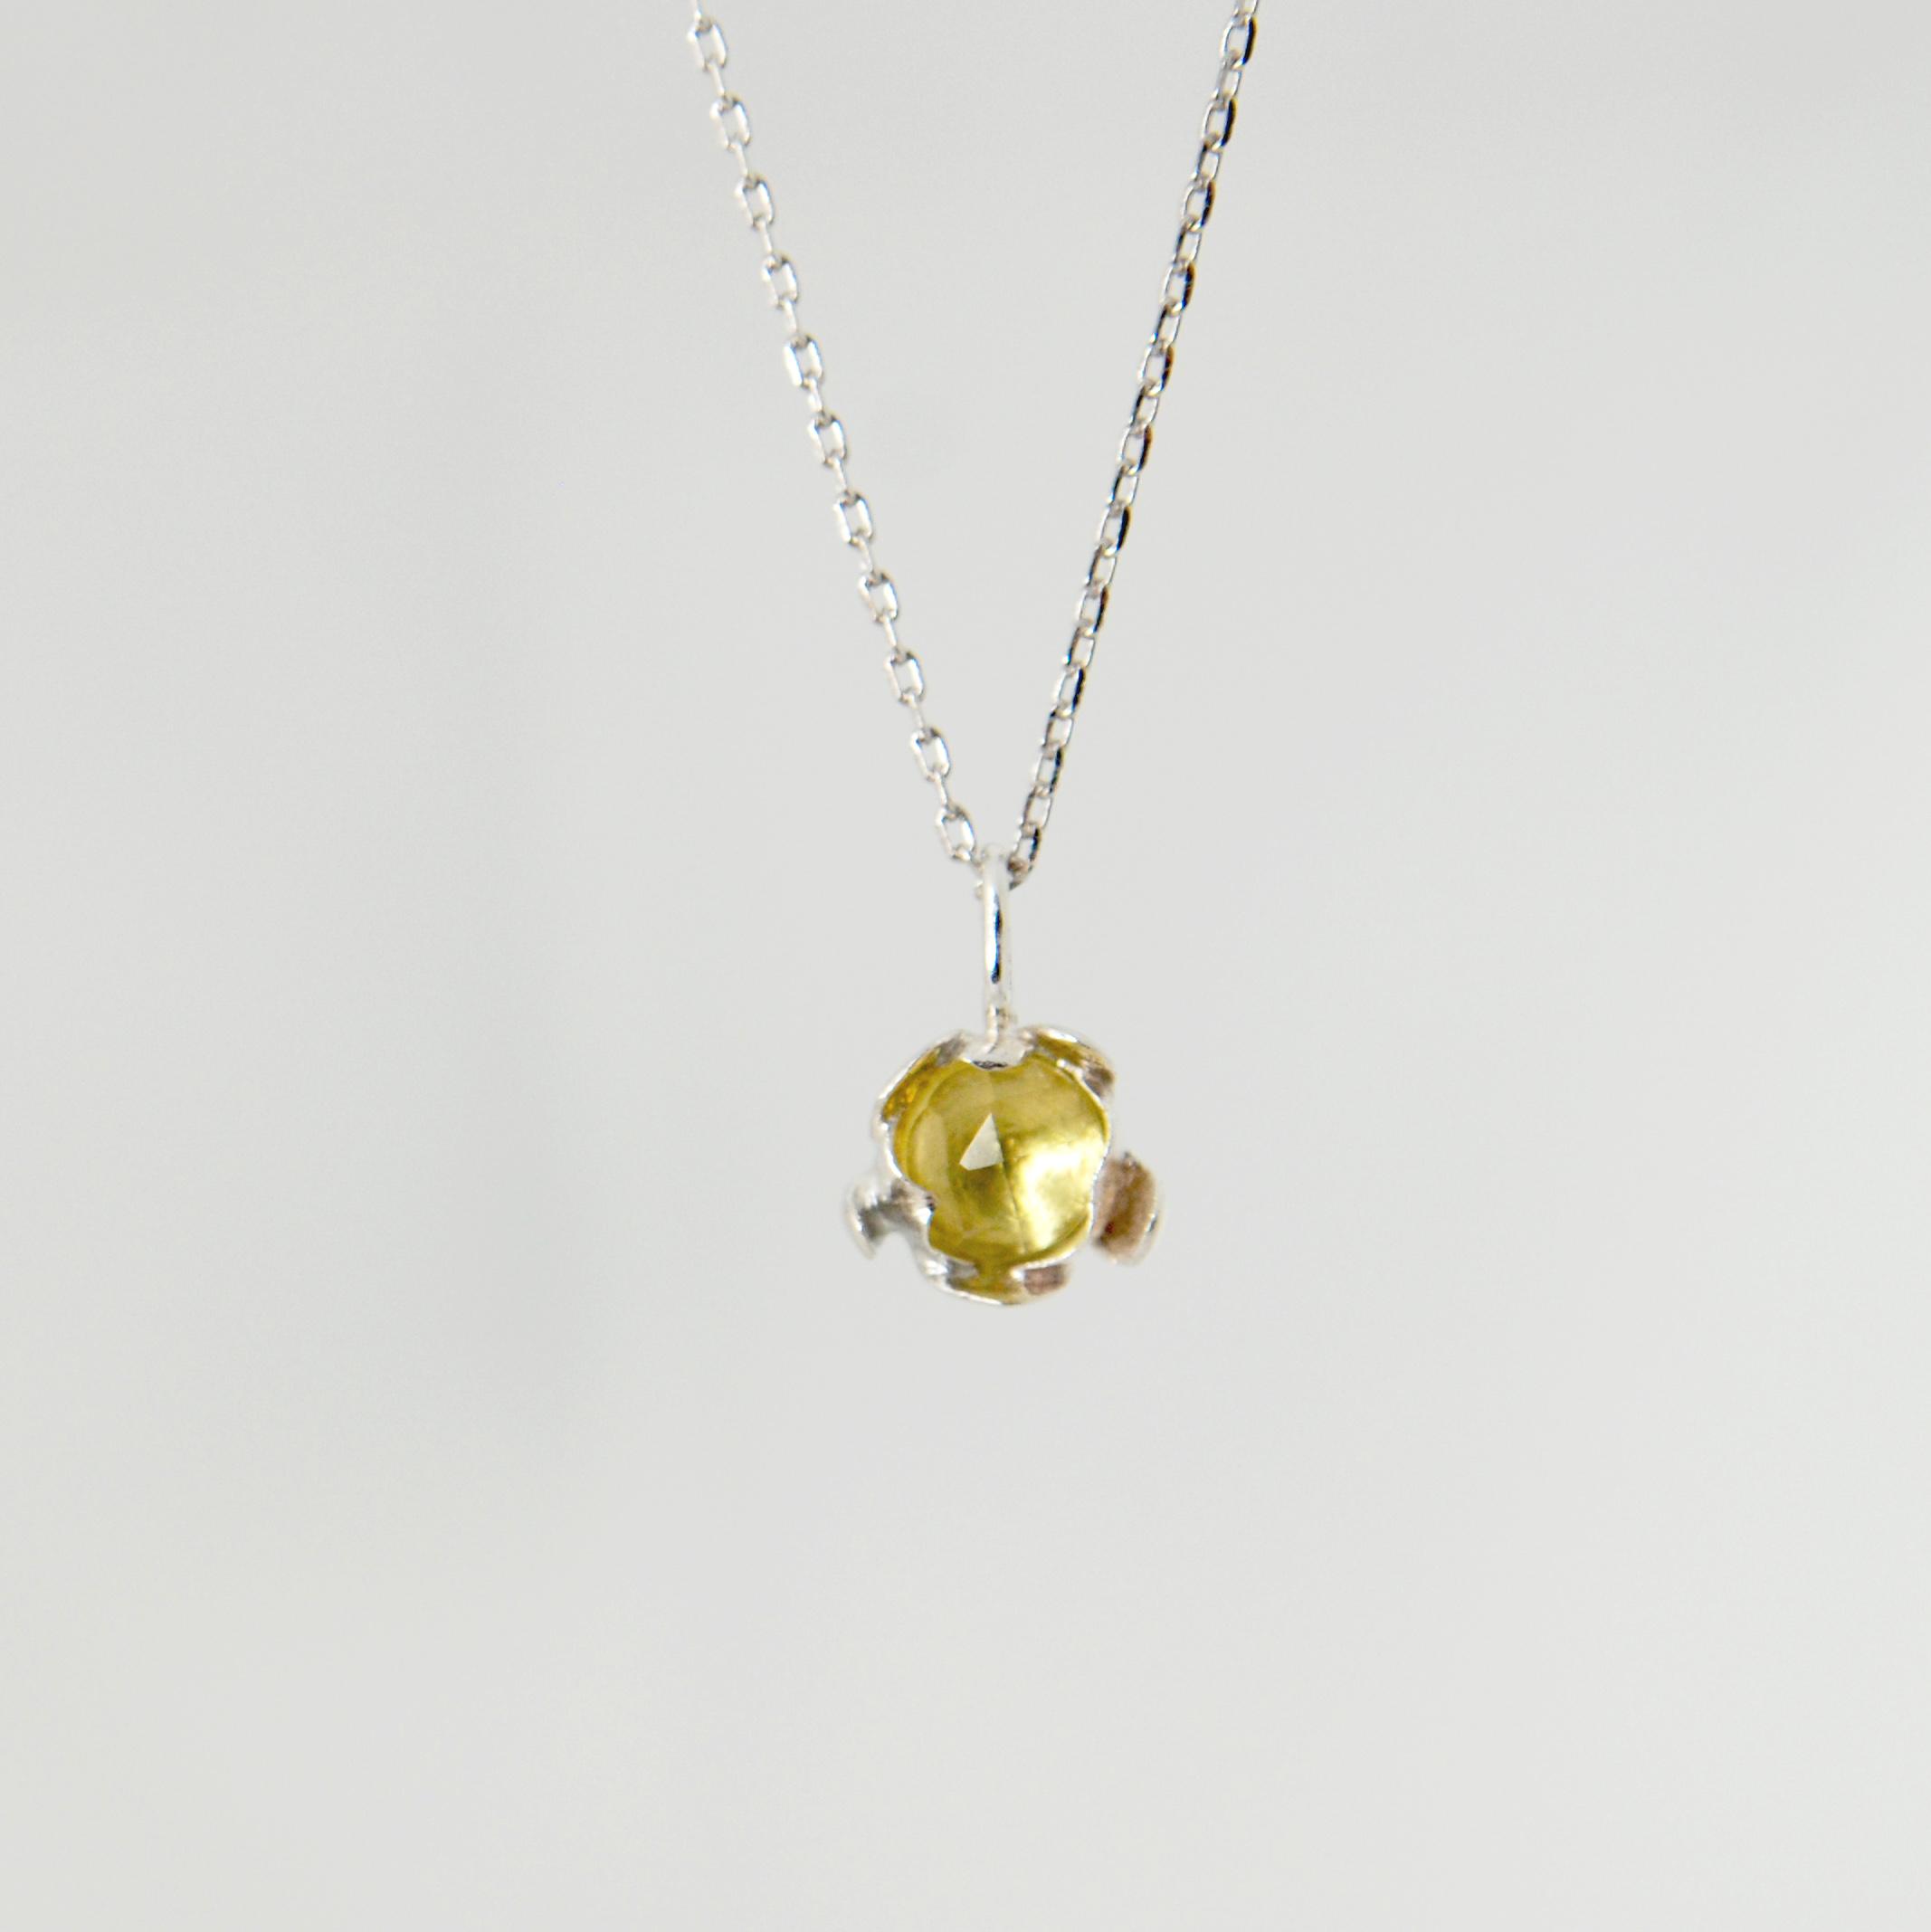 BLOSSOM floret pendant with citrine